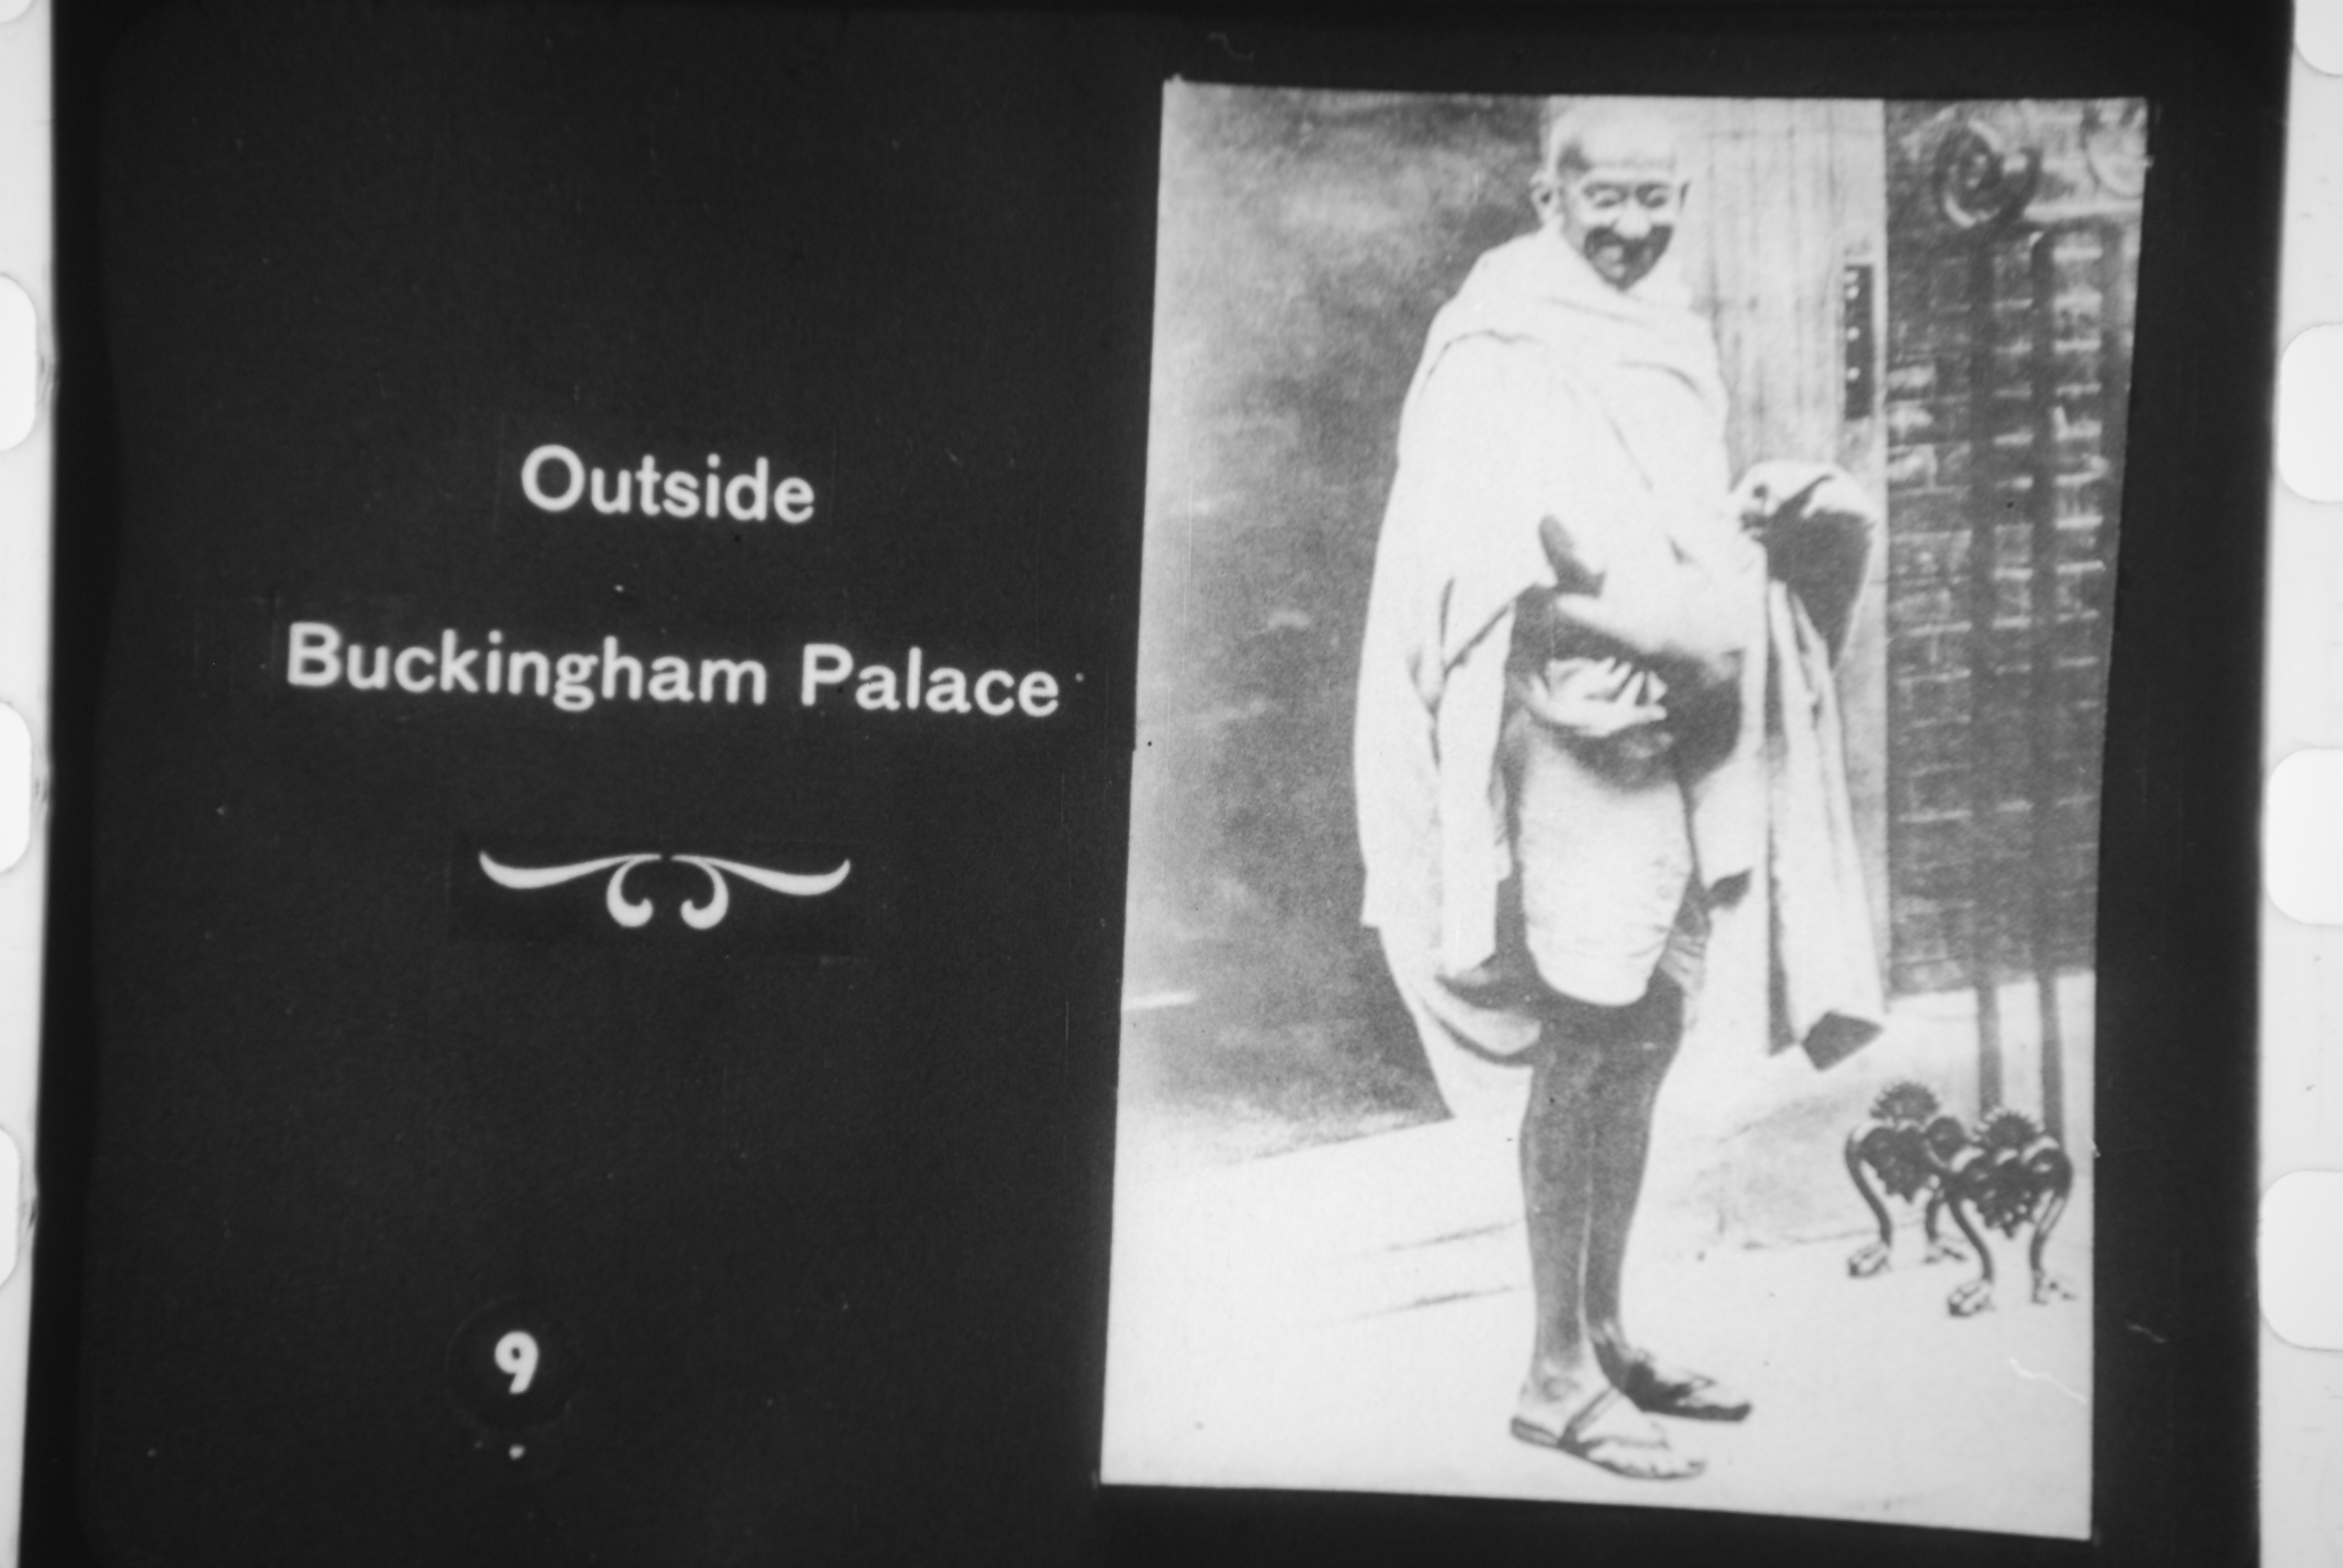 https://i2.wp.com/upload.wikimedia.org/wikipedia/commons/0/08/Gandhi_outside_Buckingham_Palace.jpg